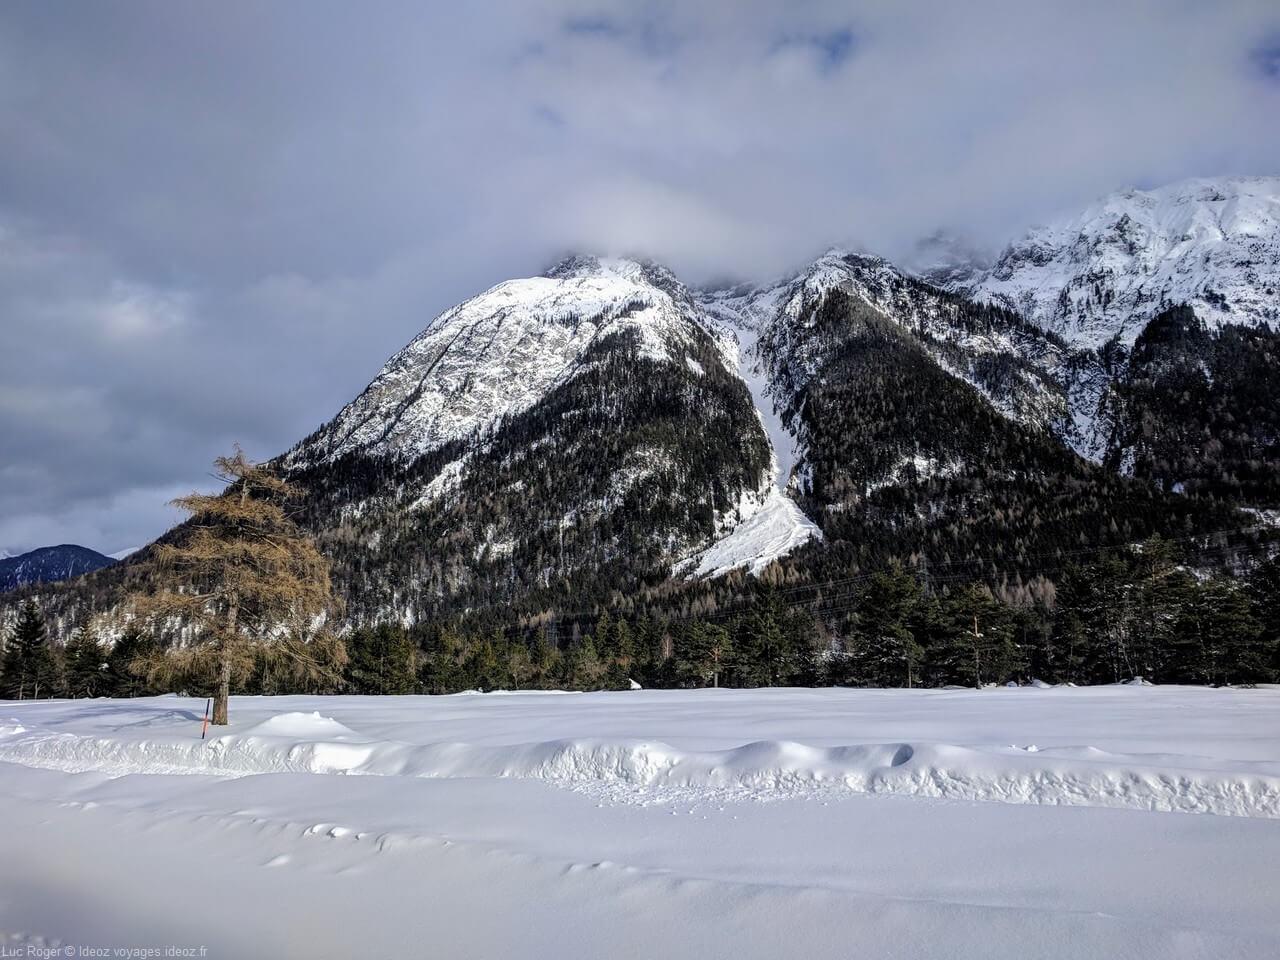 Massif enneigé à Riedboden Mittenwald en hiver